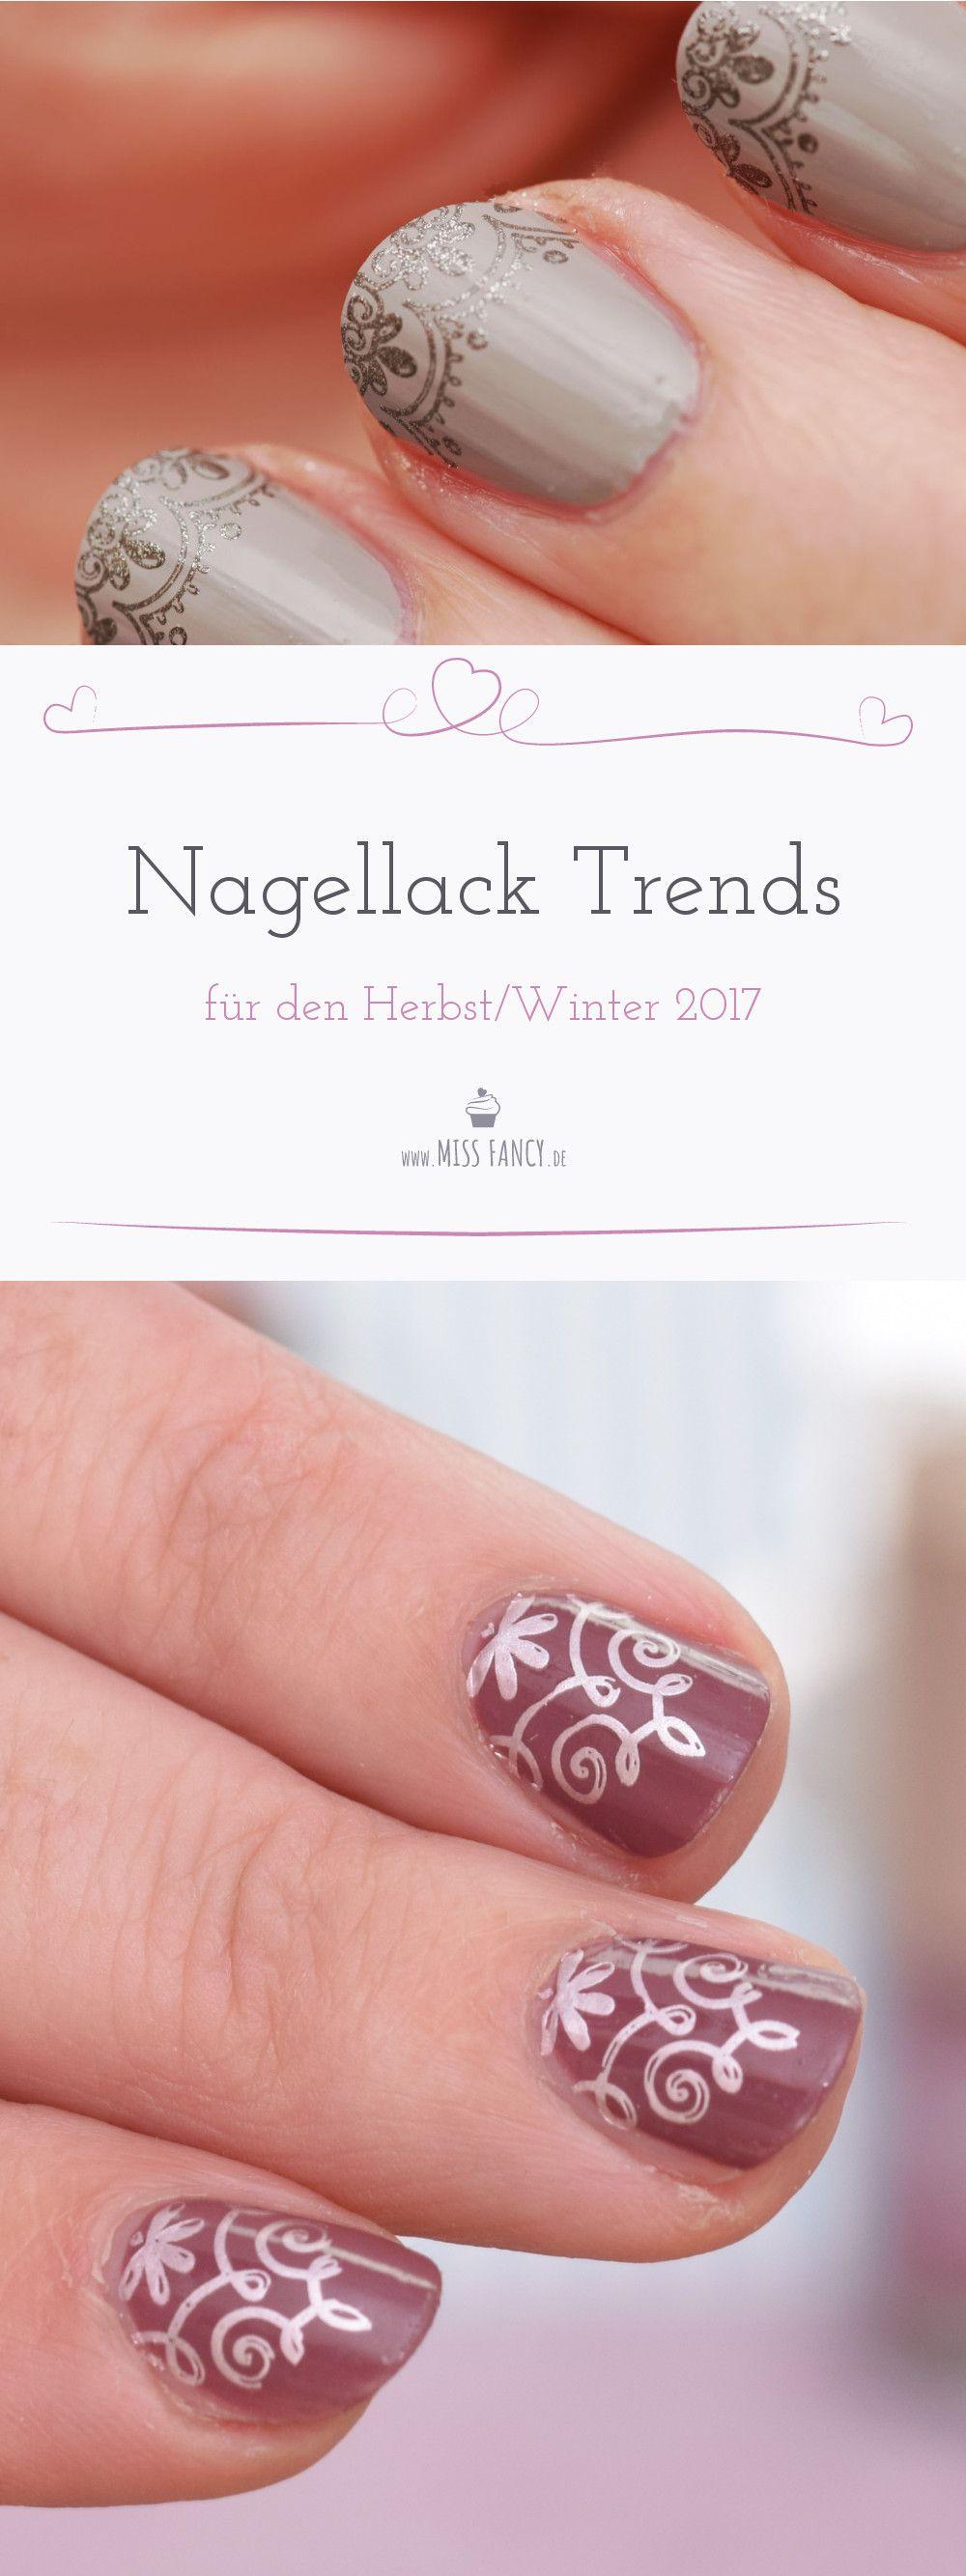 Nagellack Trendfarben Herbst 2017 | Nagellack, Nageldesign selber ...